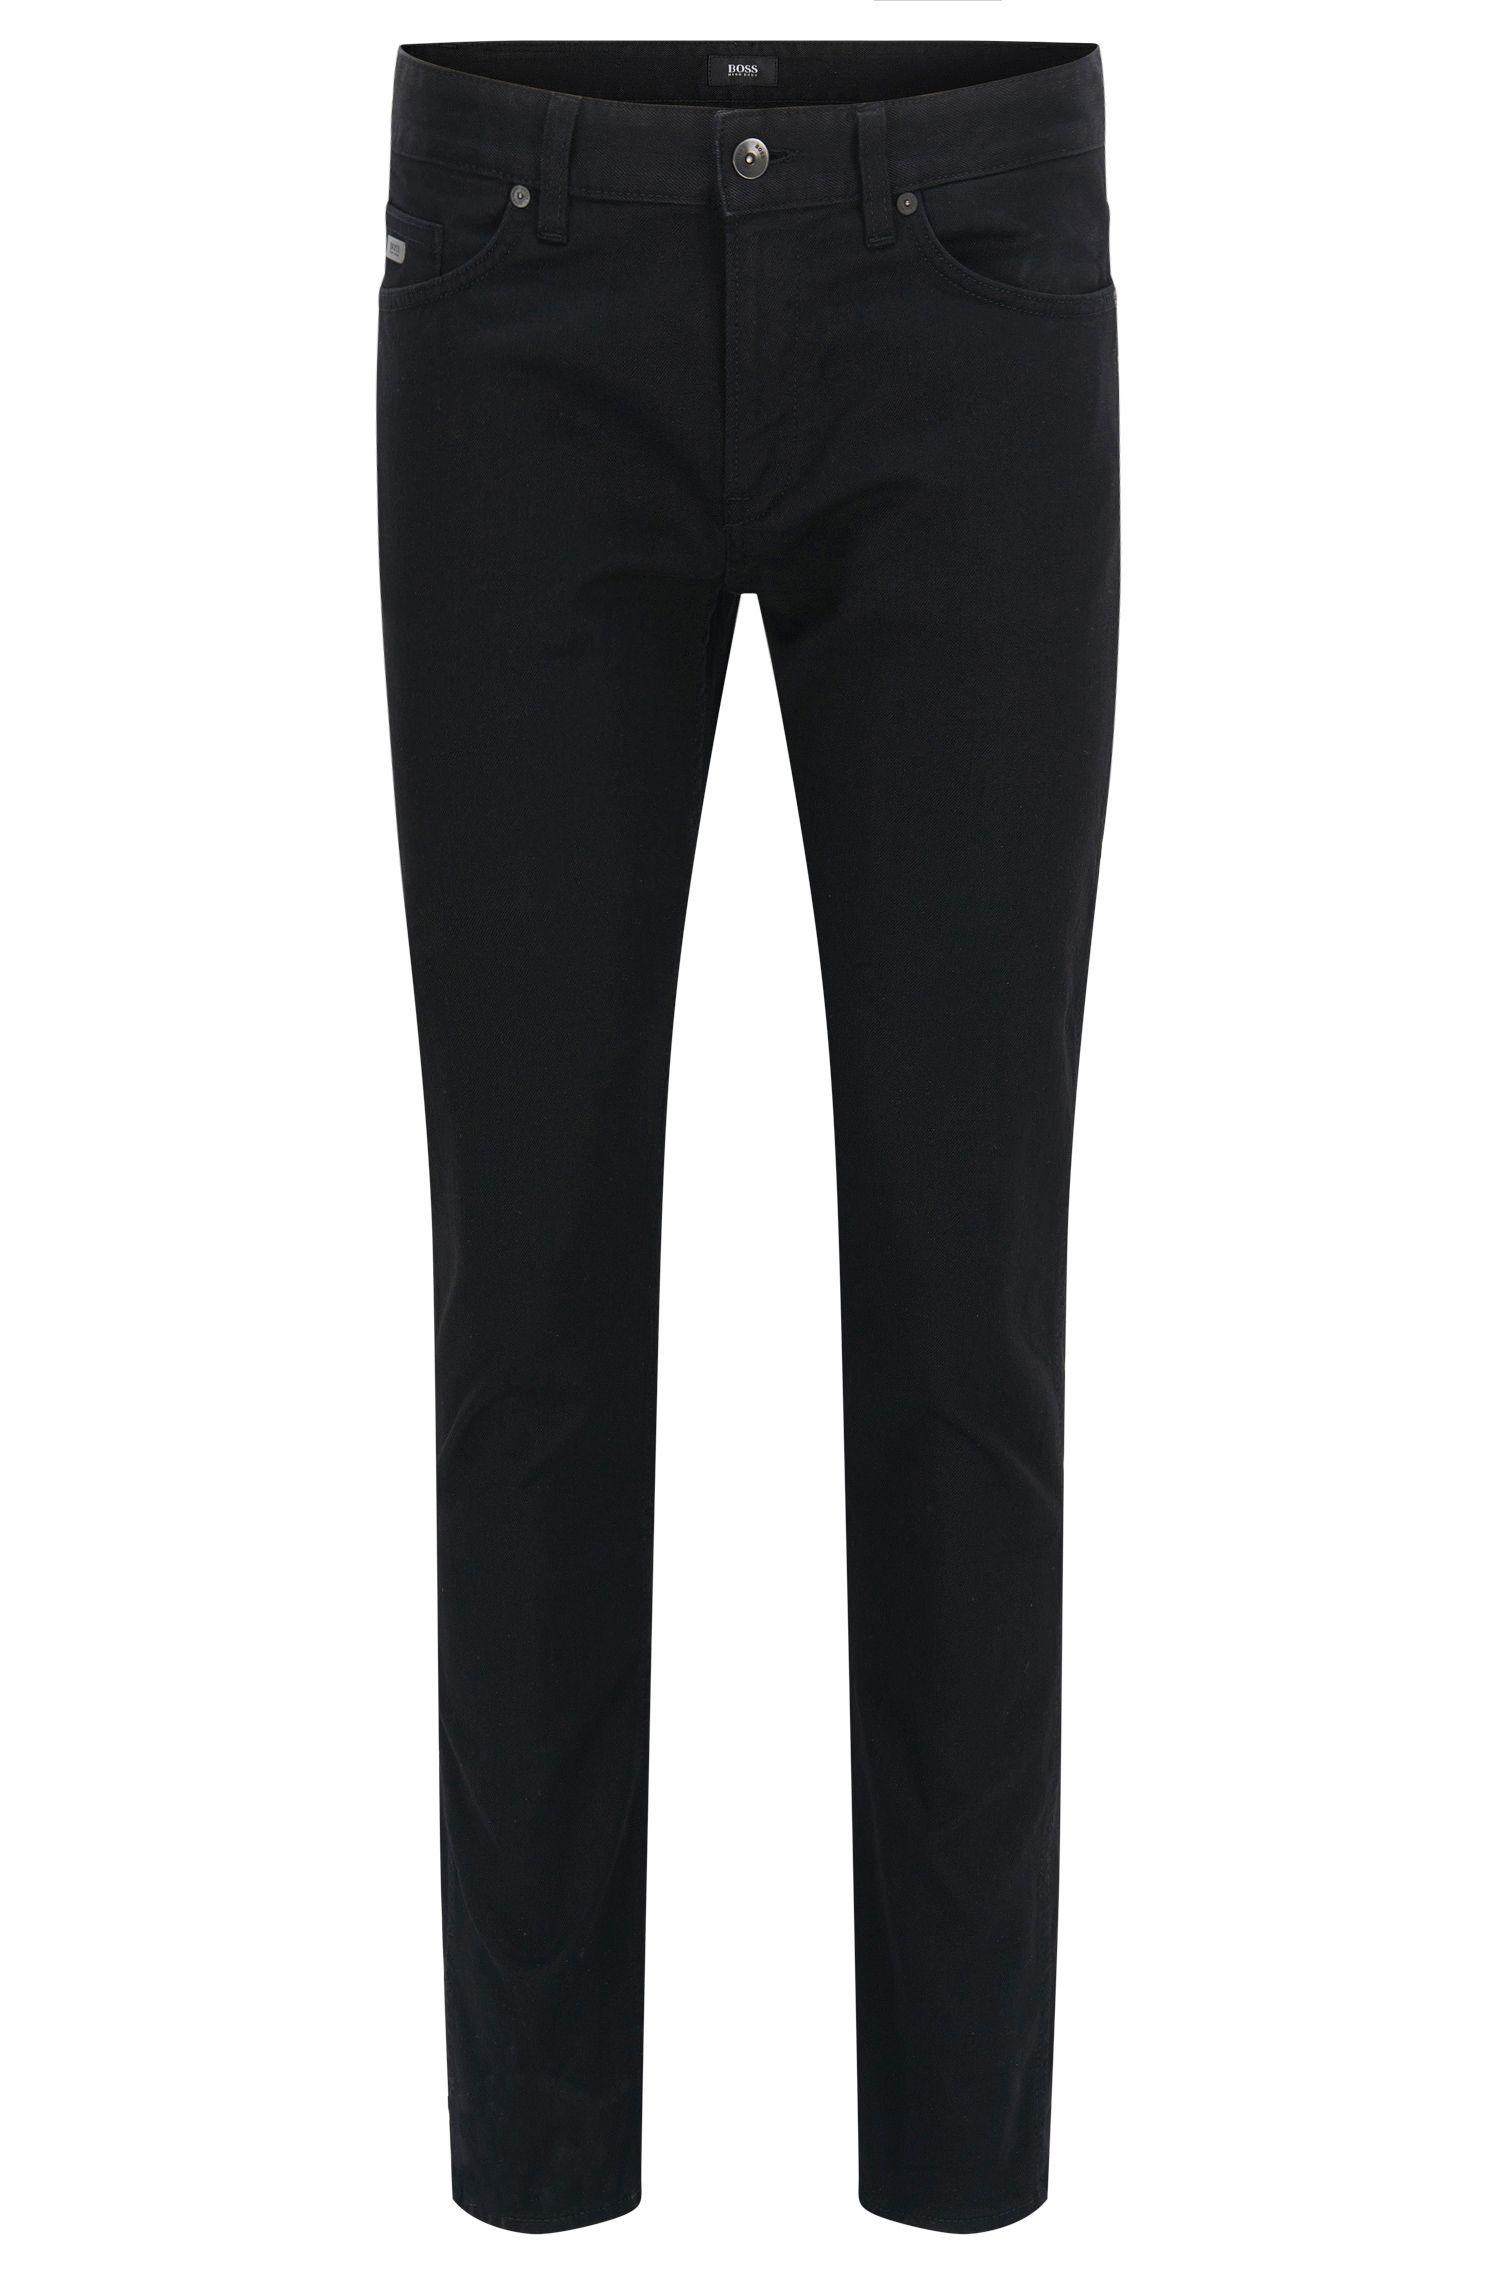 12 oz Stretch Cotton Jeans, Slim Fit | Delaware